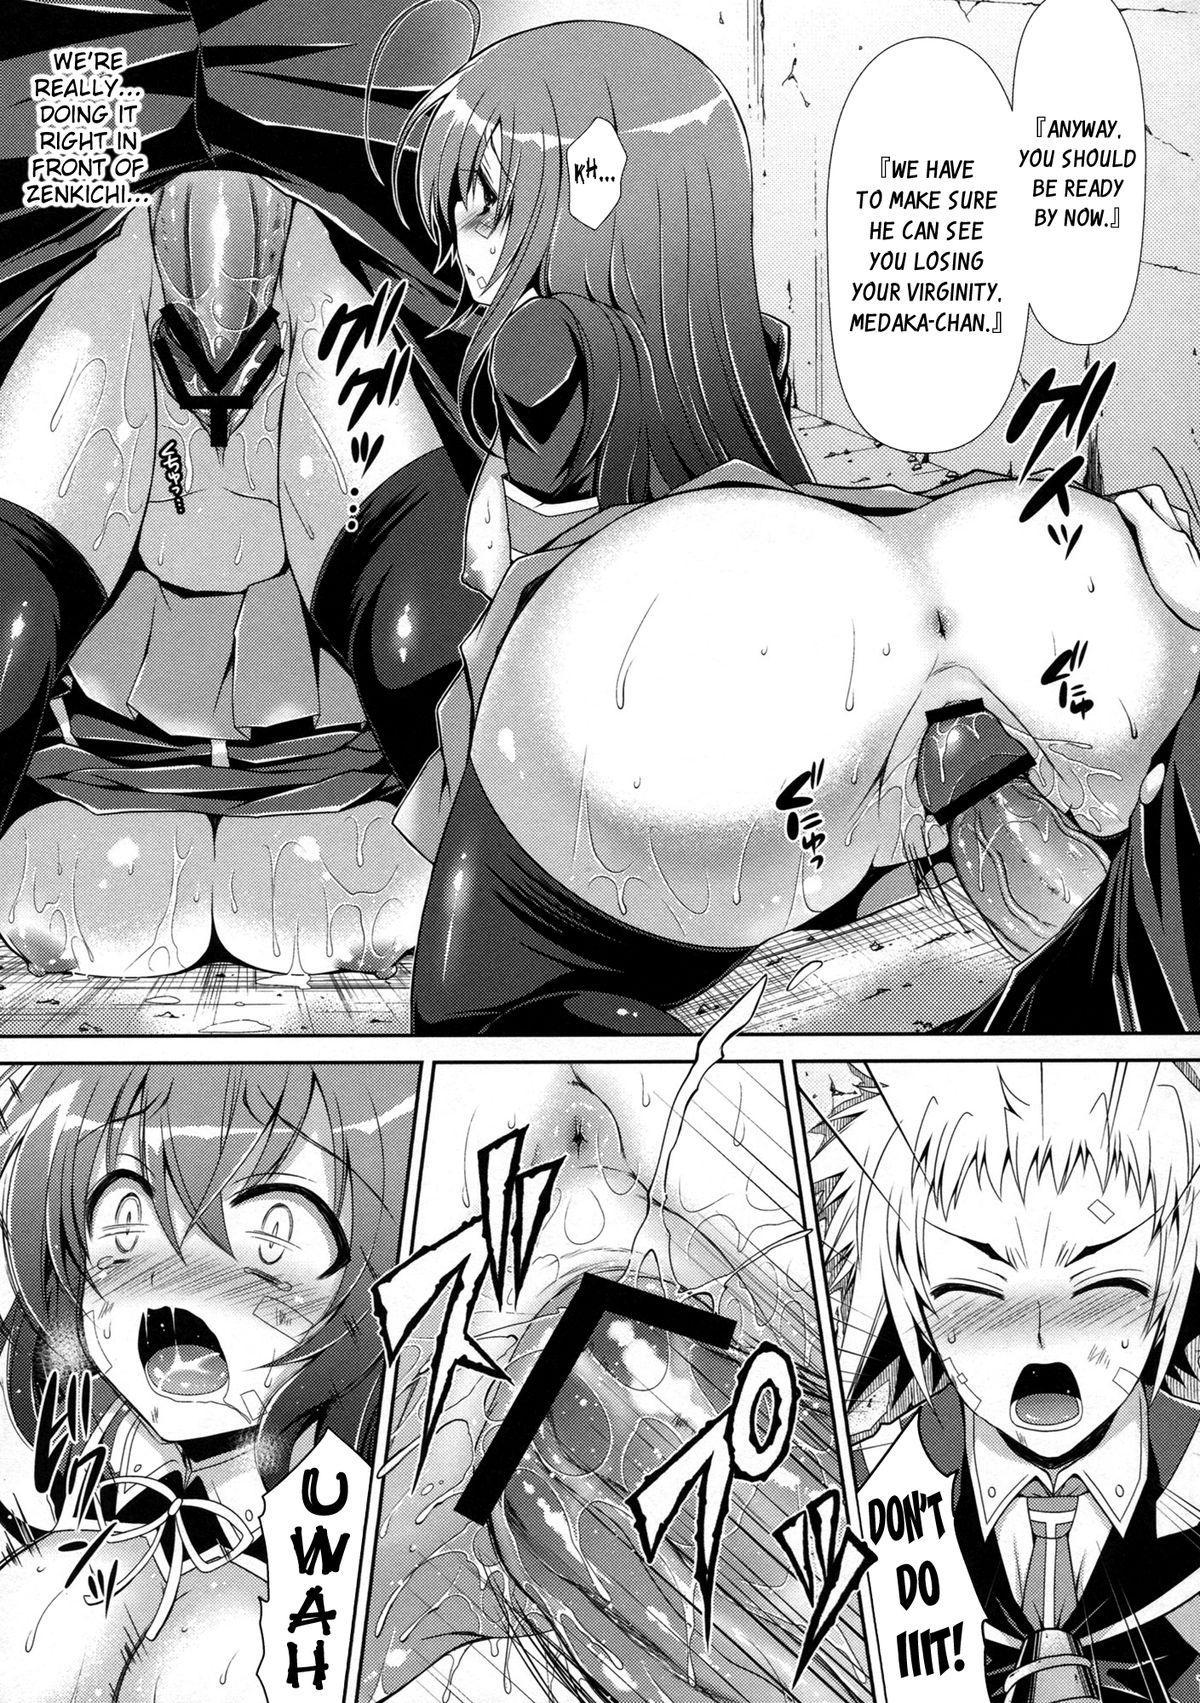 (COMIC1☆7) [Sugar*Berry*Syrup (Kuroe)] Medaka-chan ga Kumagawa-kun ni Zenkichi no Me no Mae de Rape Sareru Hon | Medaka-chan gets R_ped by Kumagawa-kun in Front of Zenkichi (Medaka Box) [English] {doujin-moe.us} 11